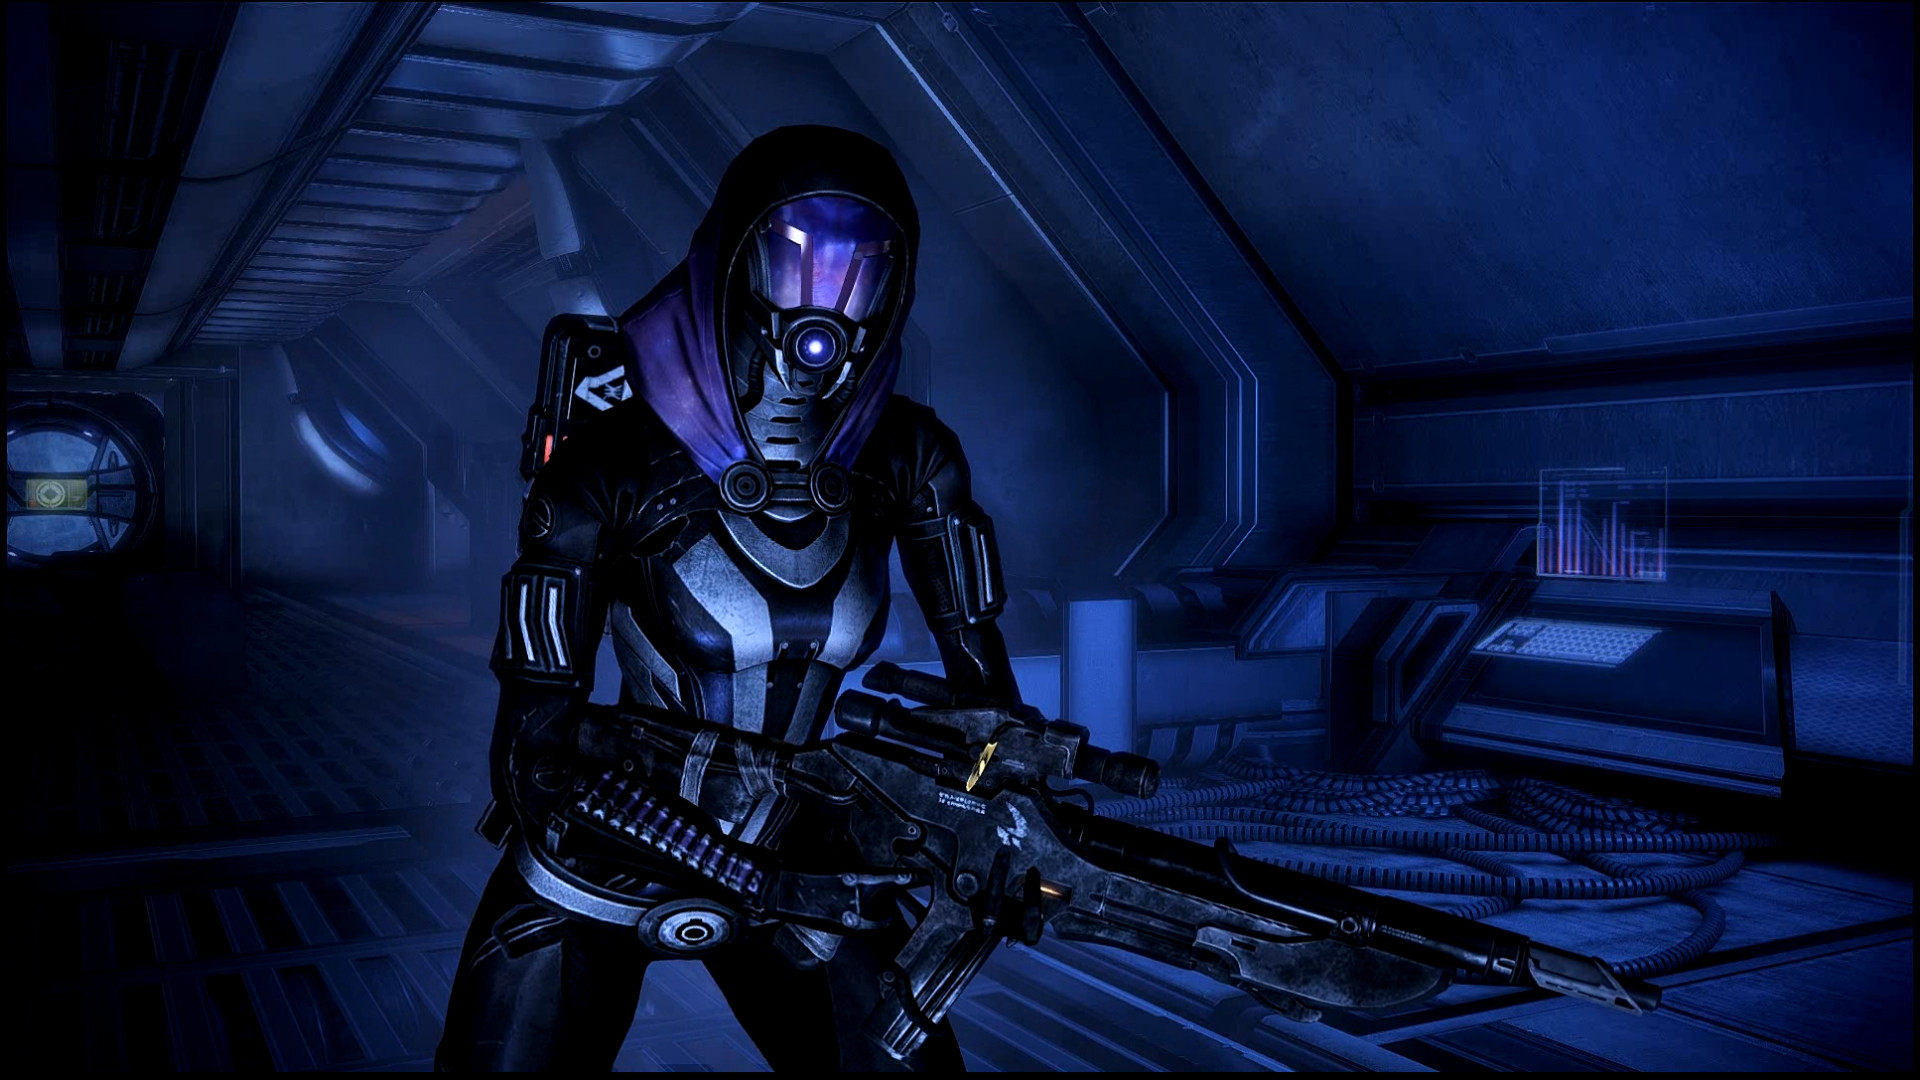 … Mass Effect 3 Tali Dreamscene by droot1986